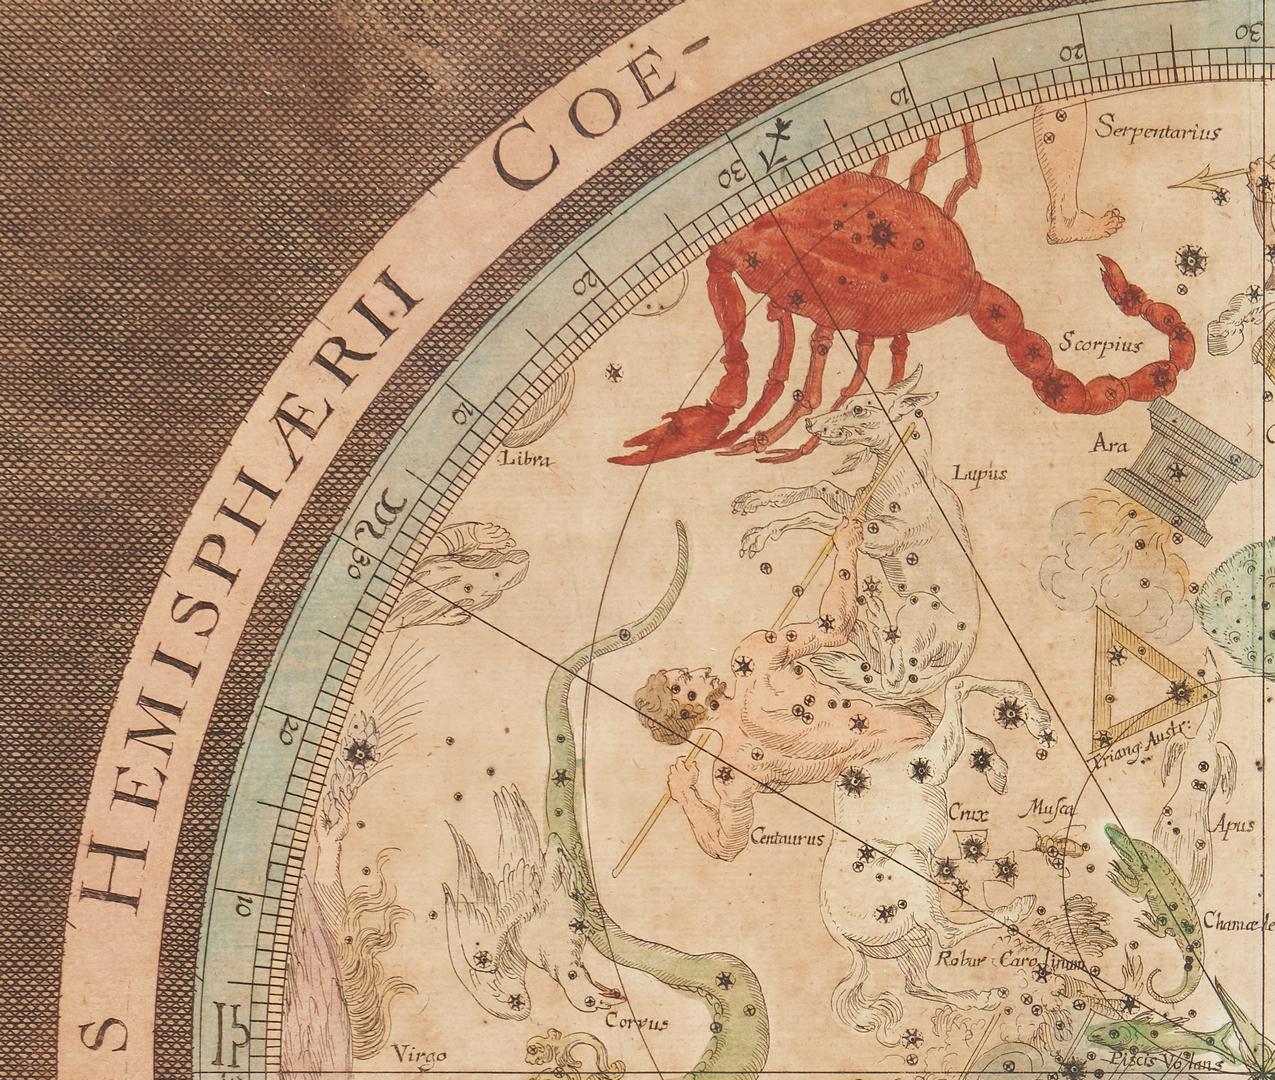 Lot 707: Pair of Baroque Celestial Maps, Johann Zahn